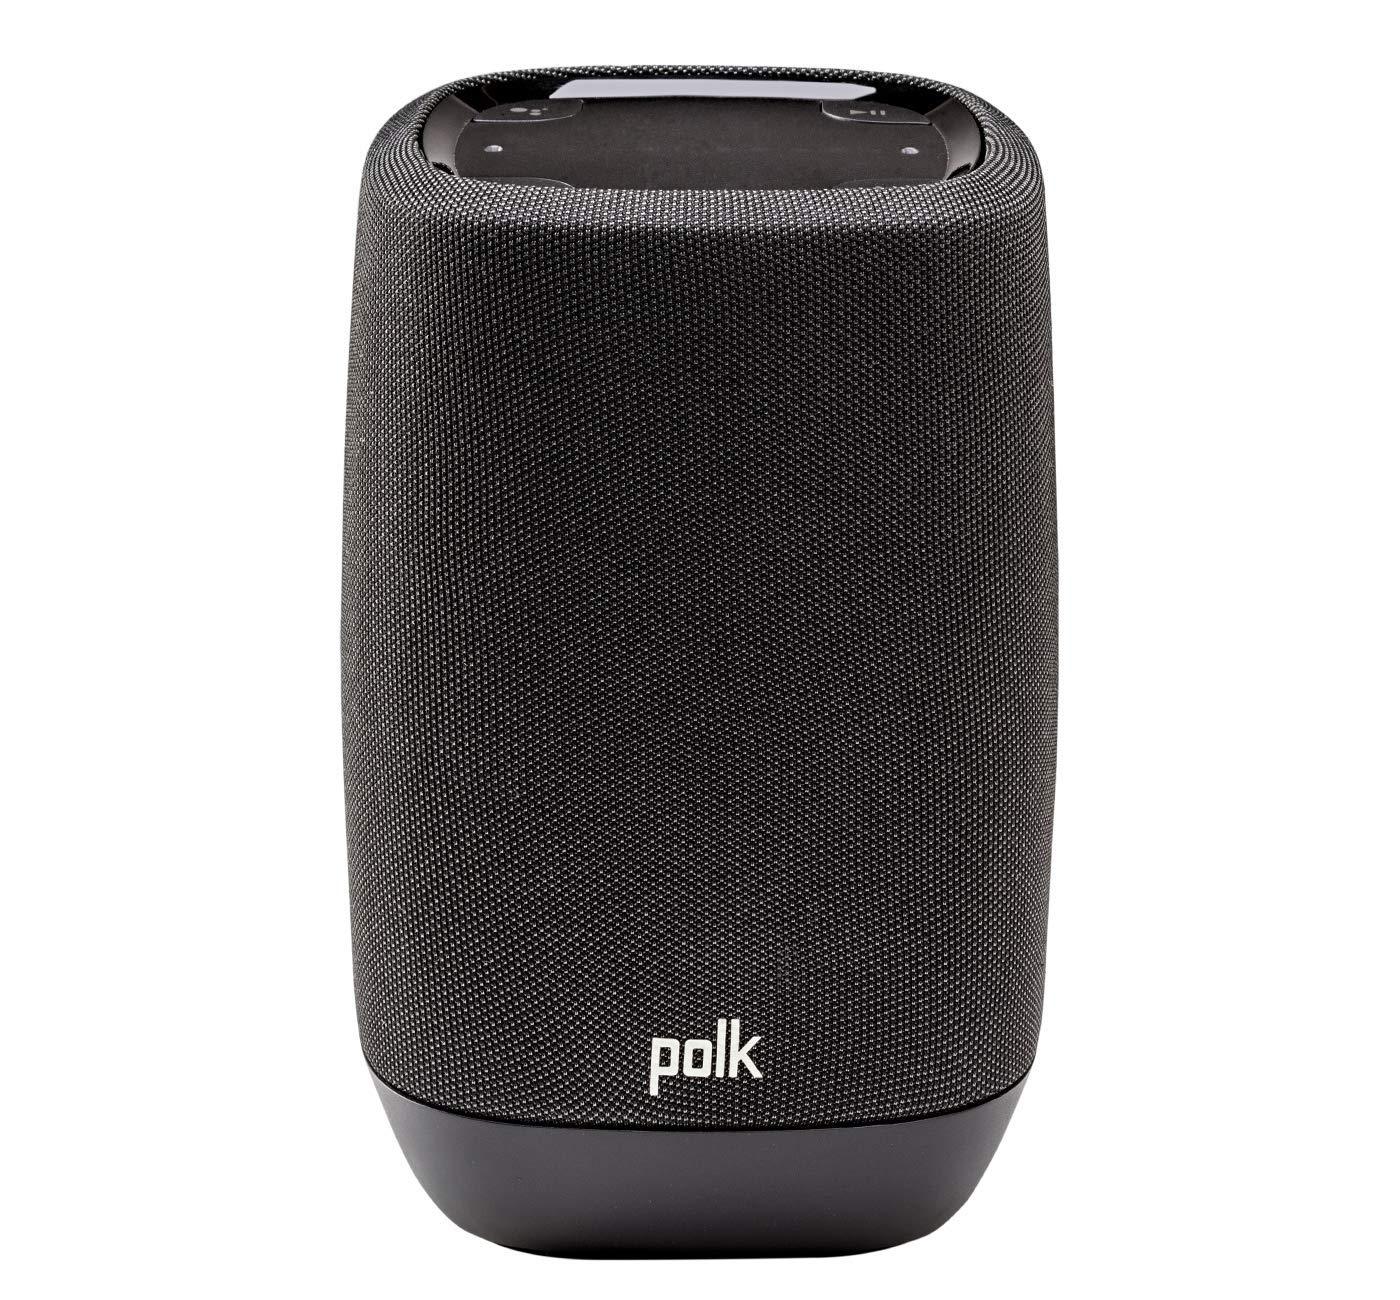 Polk Audio ASSISTUKBK Smart Speaker with Google Assistant Built-In – Midnight Black